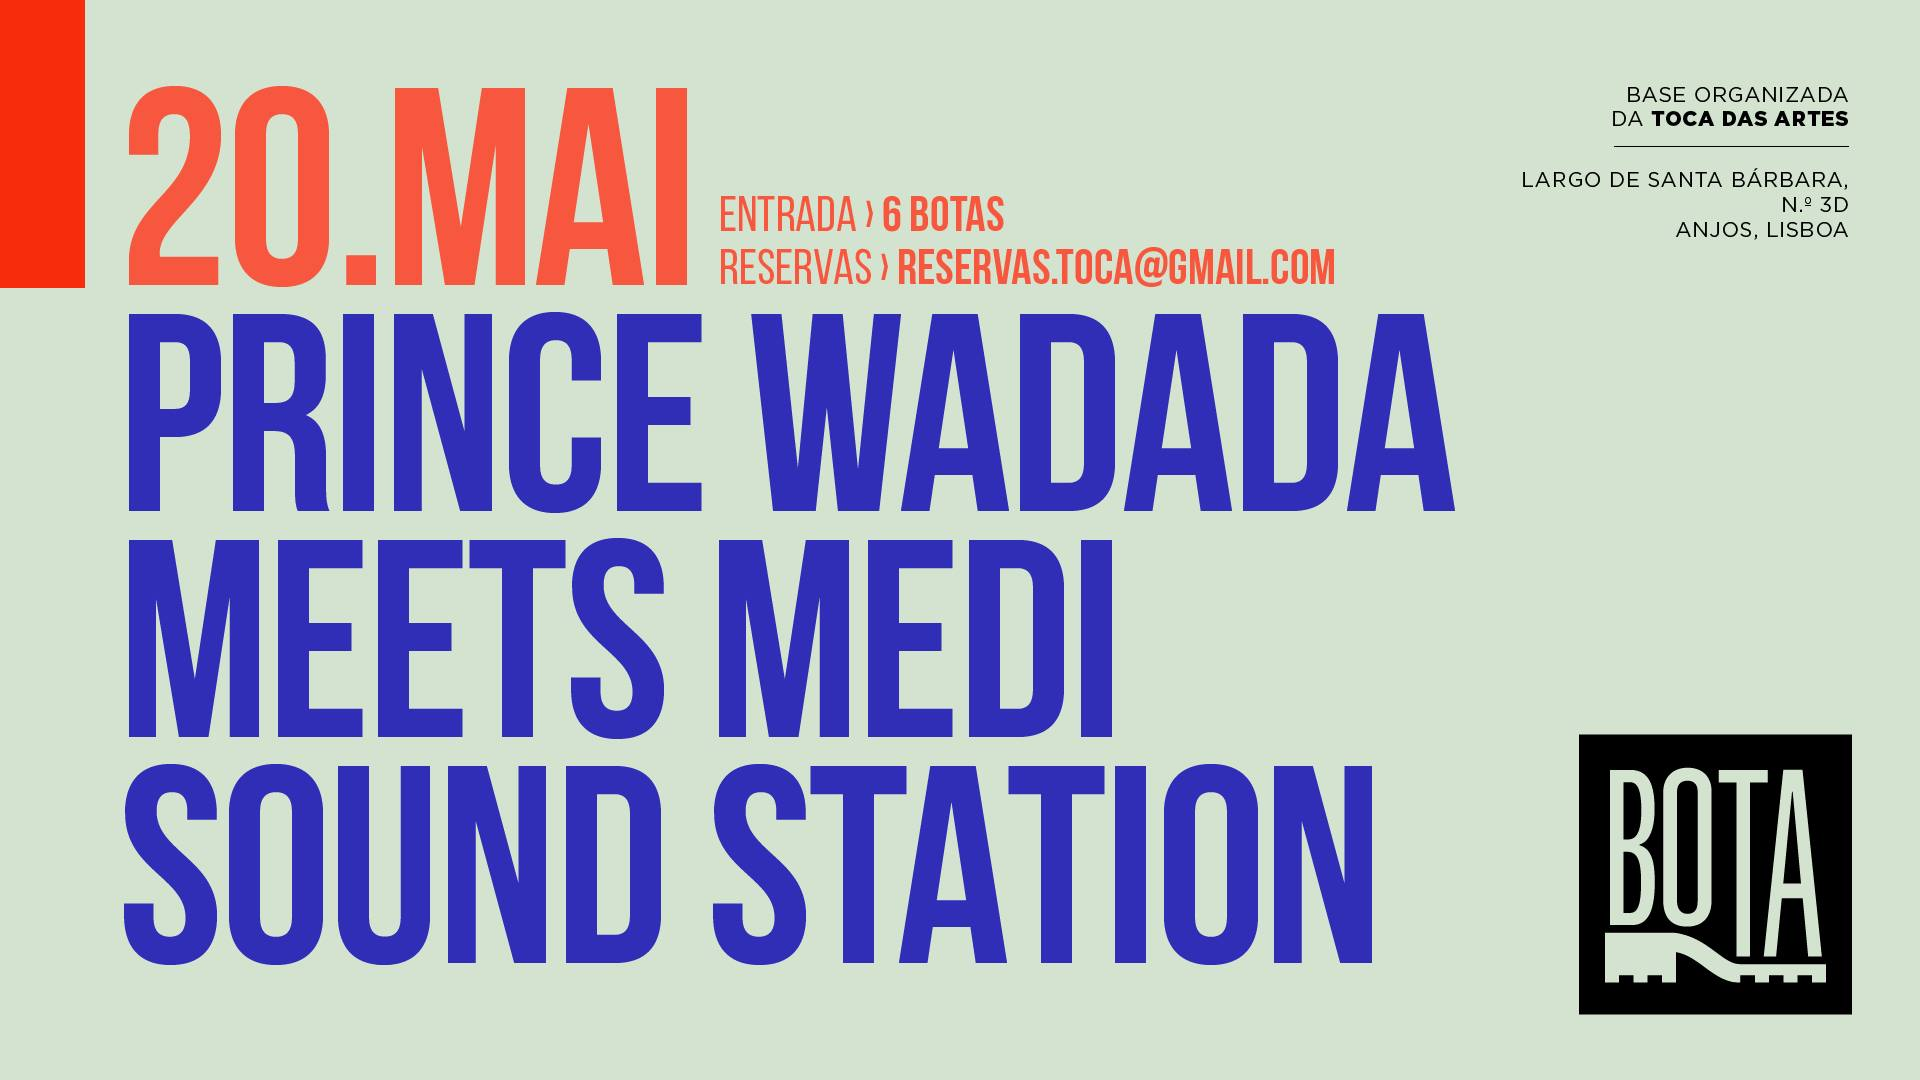 Prince Wadada meets Medi Sound Station na BOTA